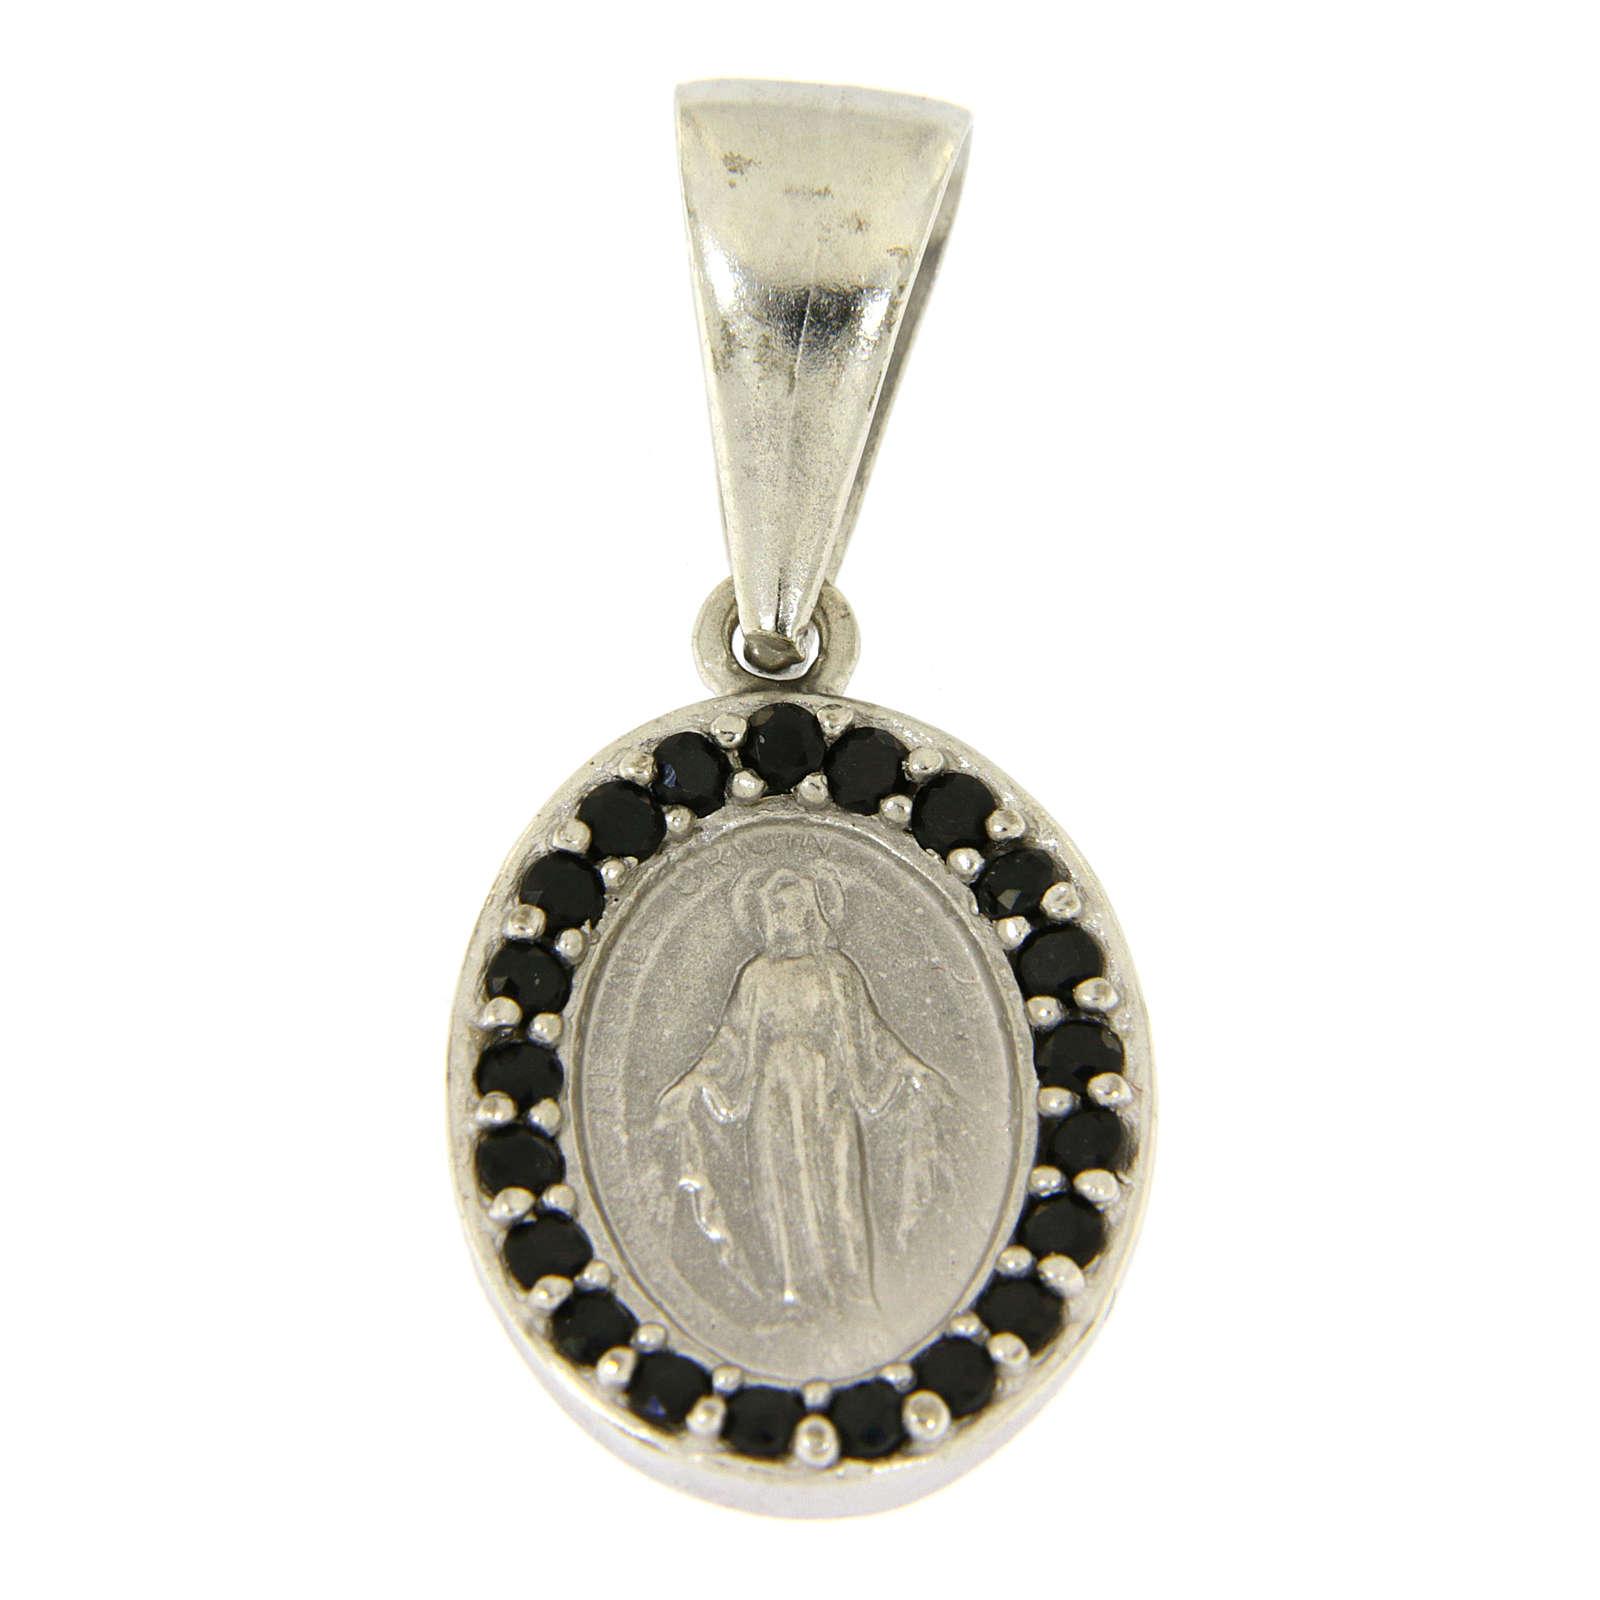 Ciondolo Madonna Miracolosa argento 925 zirconi neri 4